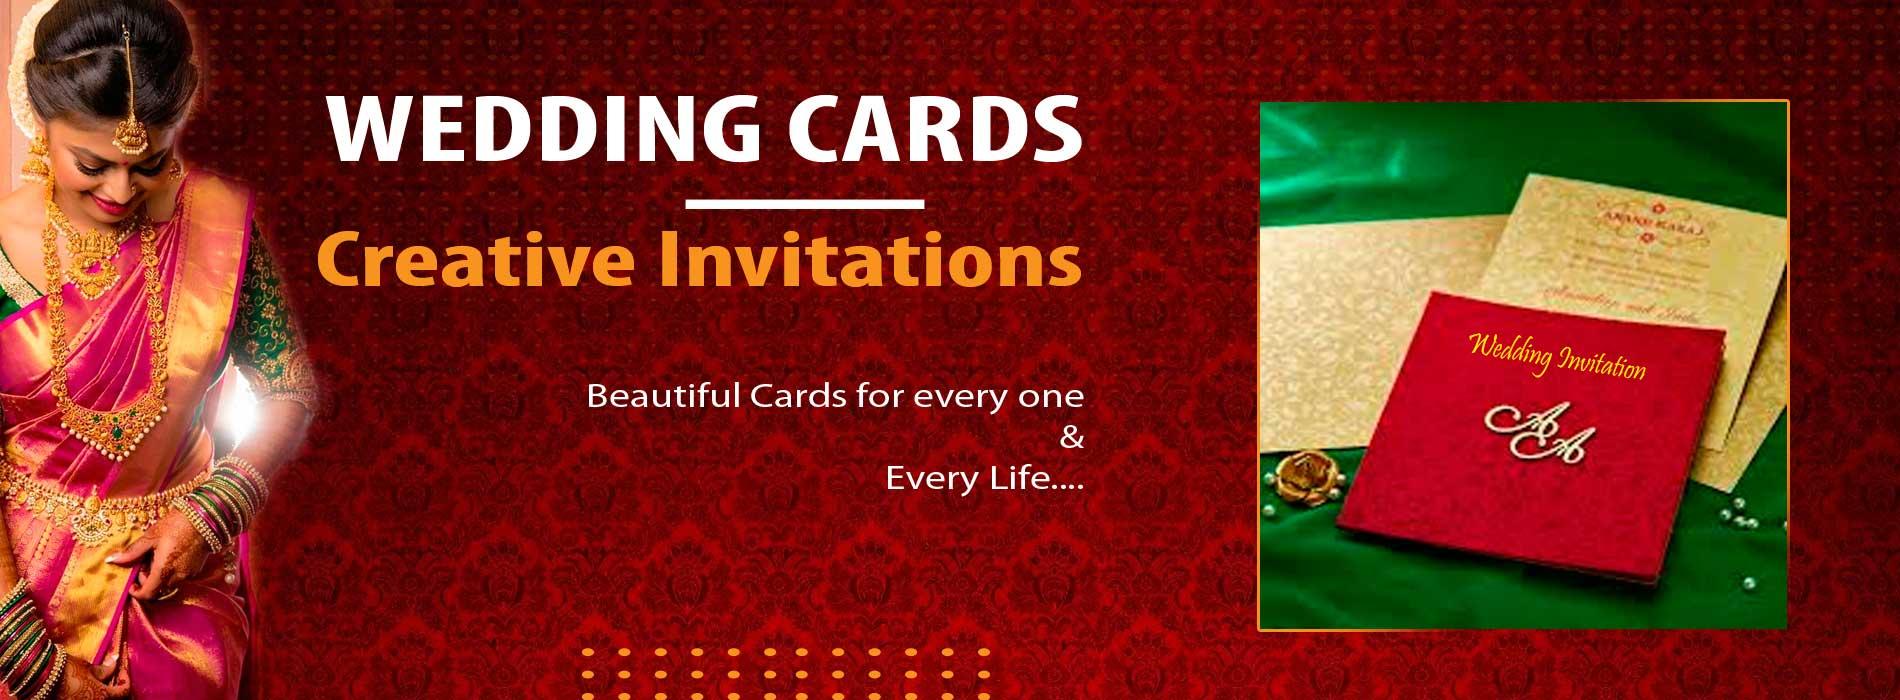 2 Wedding Cards